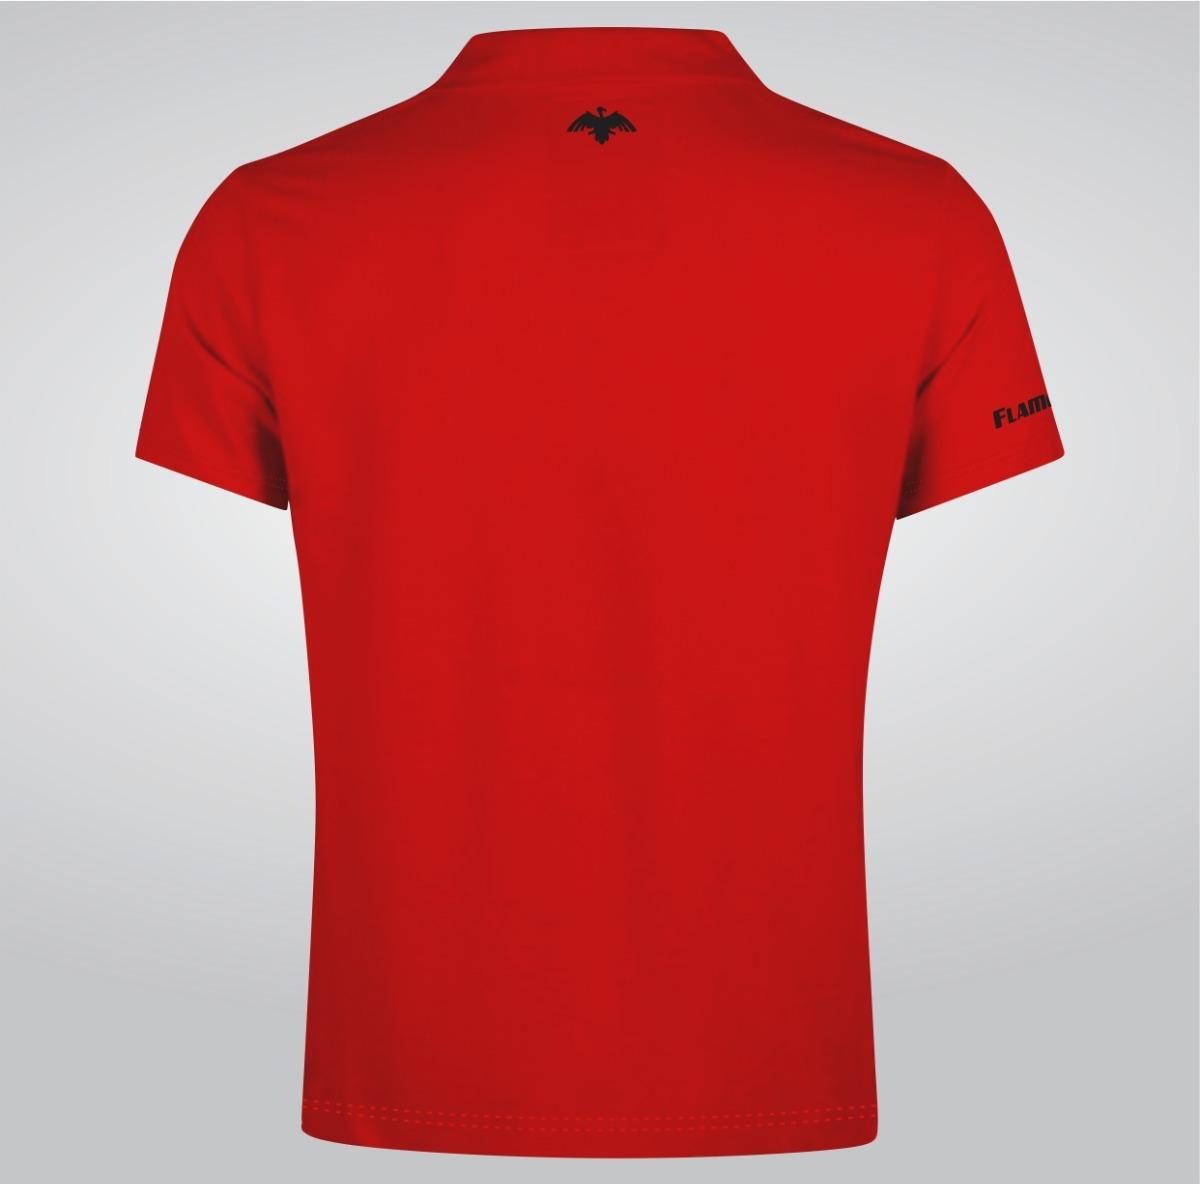 9347ab947f085 Camisa Camiseta Flamengo Polo Torcedor Preto Ou Branco Fla - R  54 ...